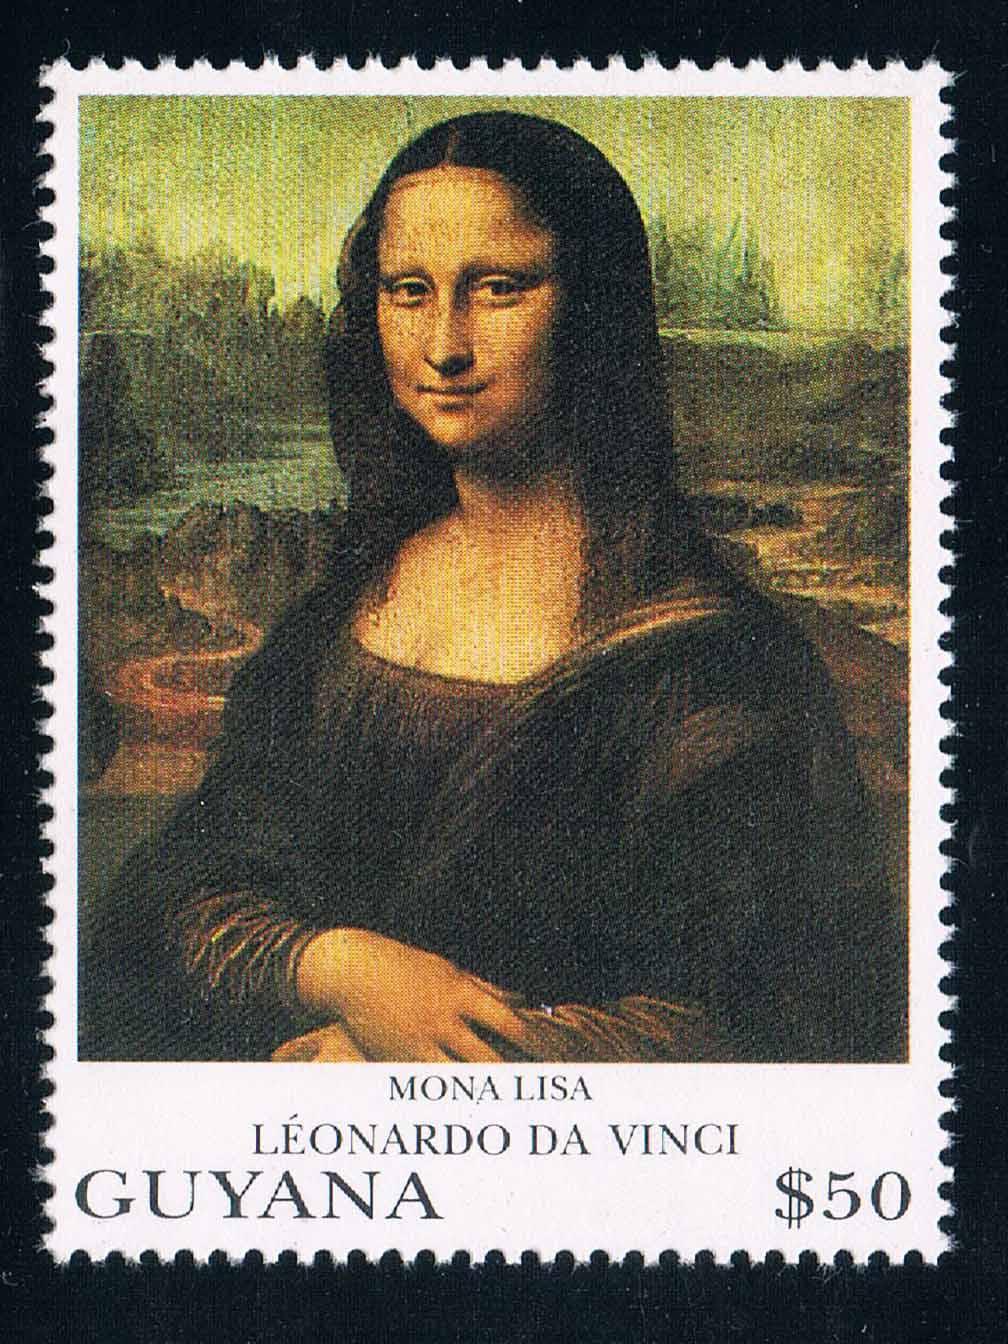 DA0689 Guyana 1993 Da Vinci world famous painting Mona Lisa 1 new stamps 1008 конструкторы bridge мост leonardo da vinci